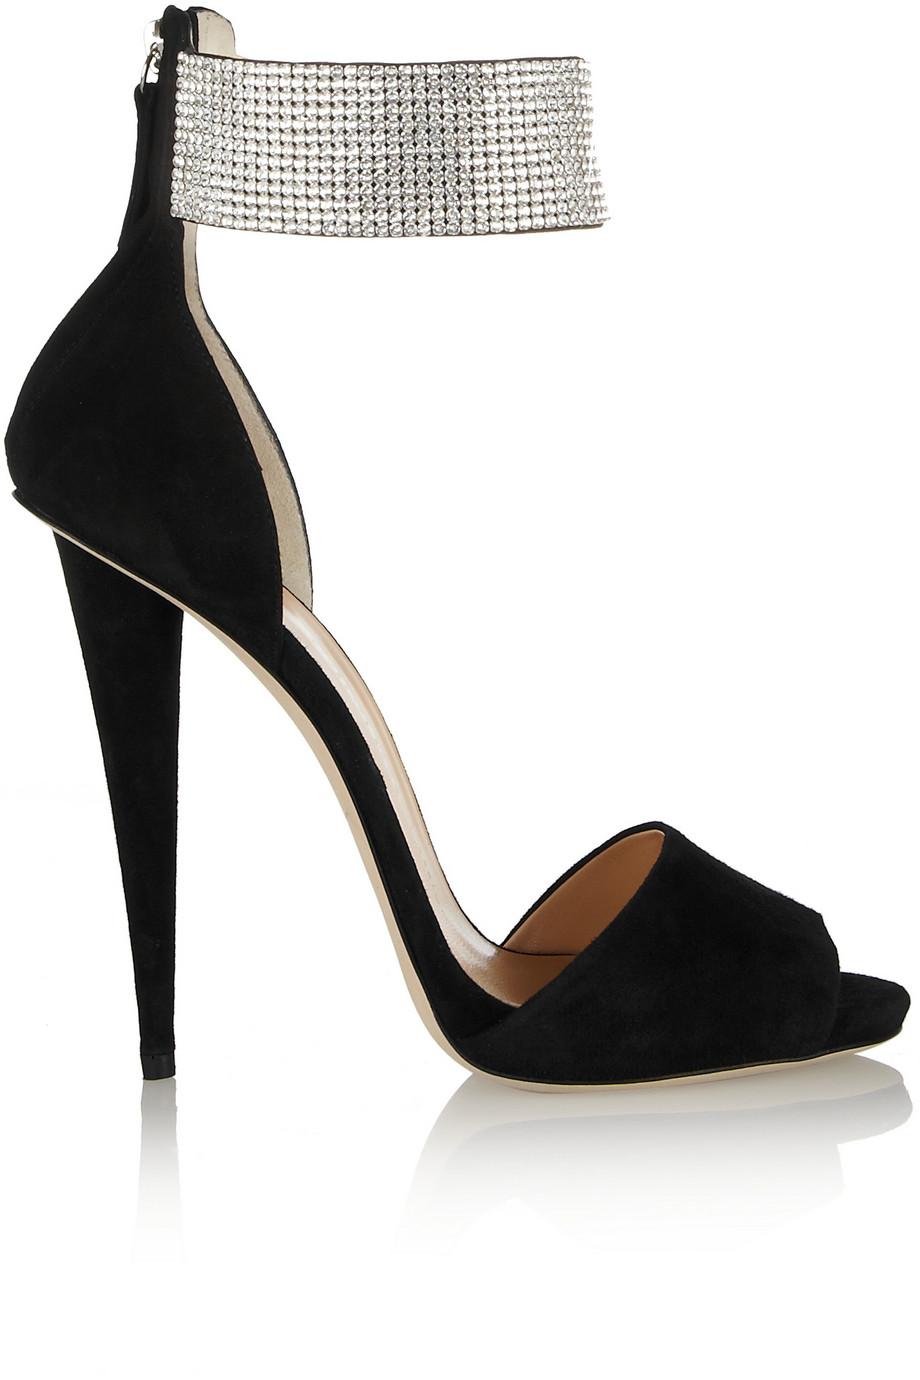 c8c33d414cd Lyst - Giuseppe Zanotti Alien Crystal-Embellished Suede Sandals in Black